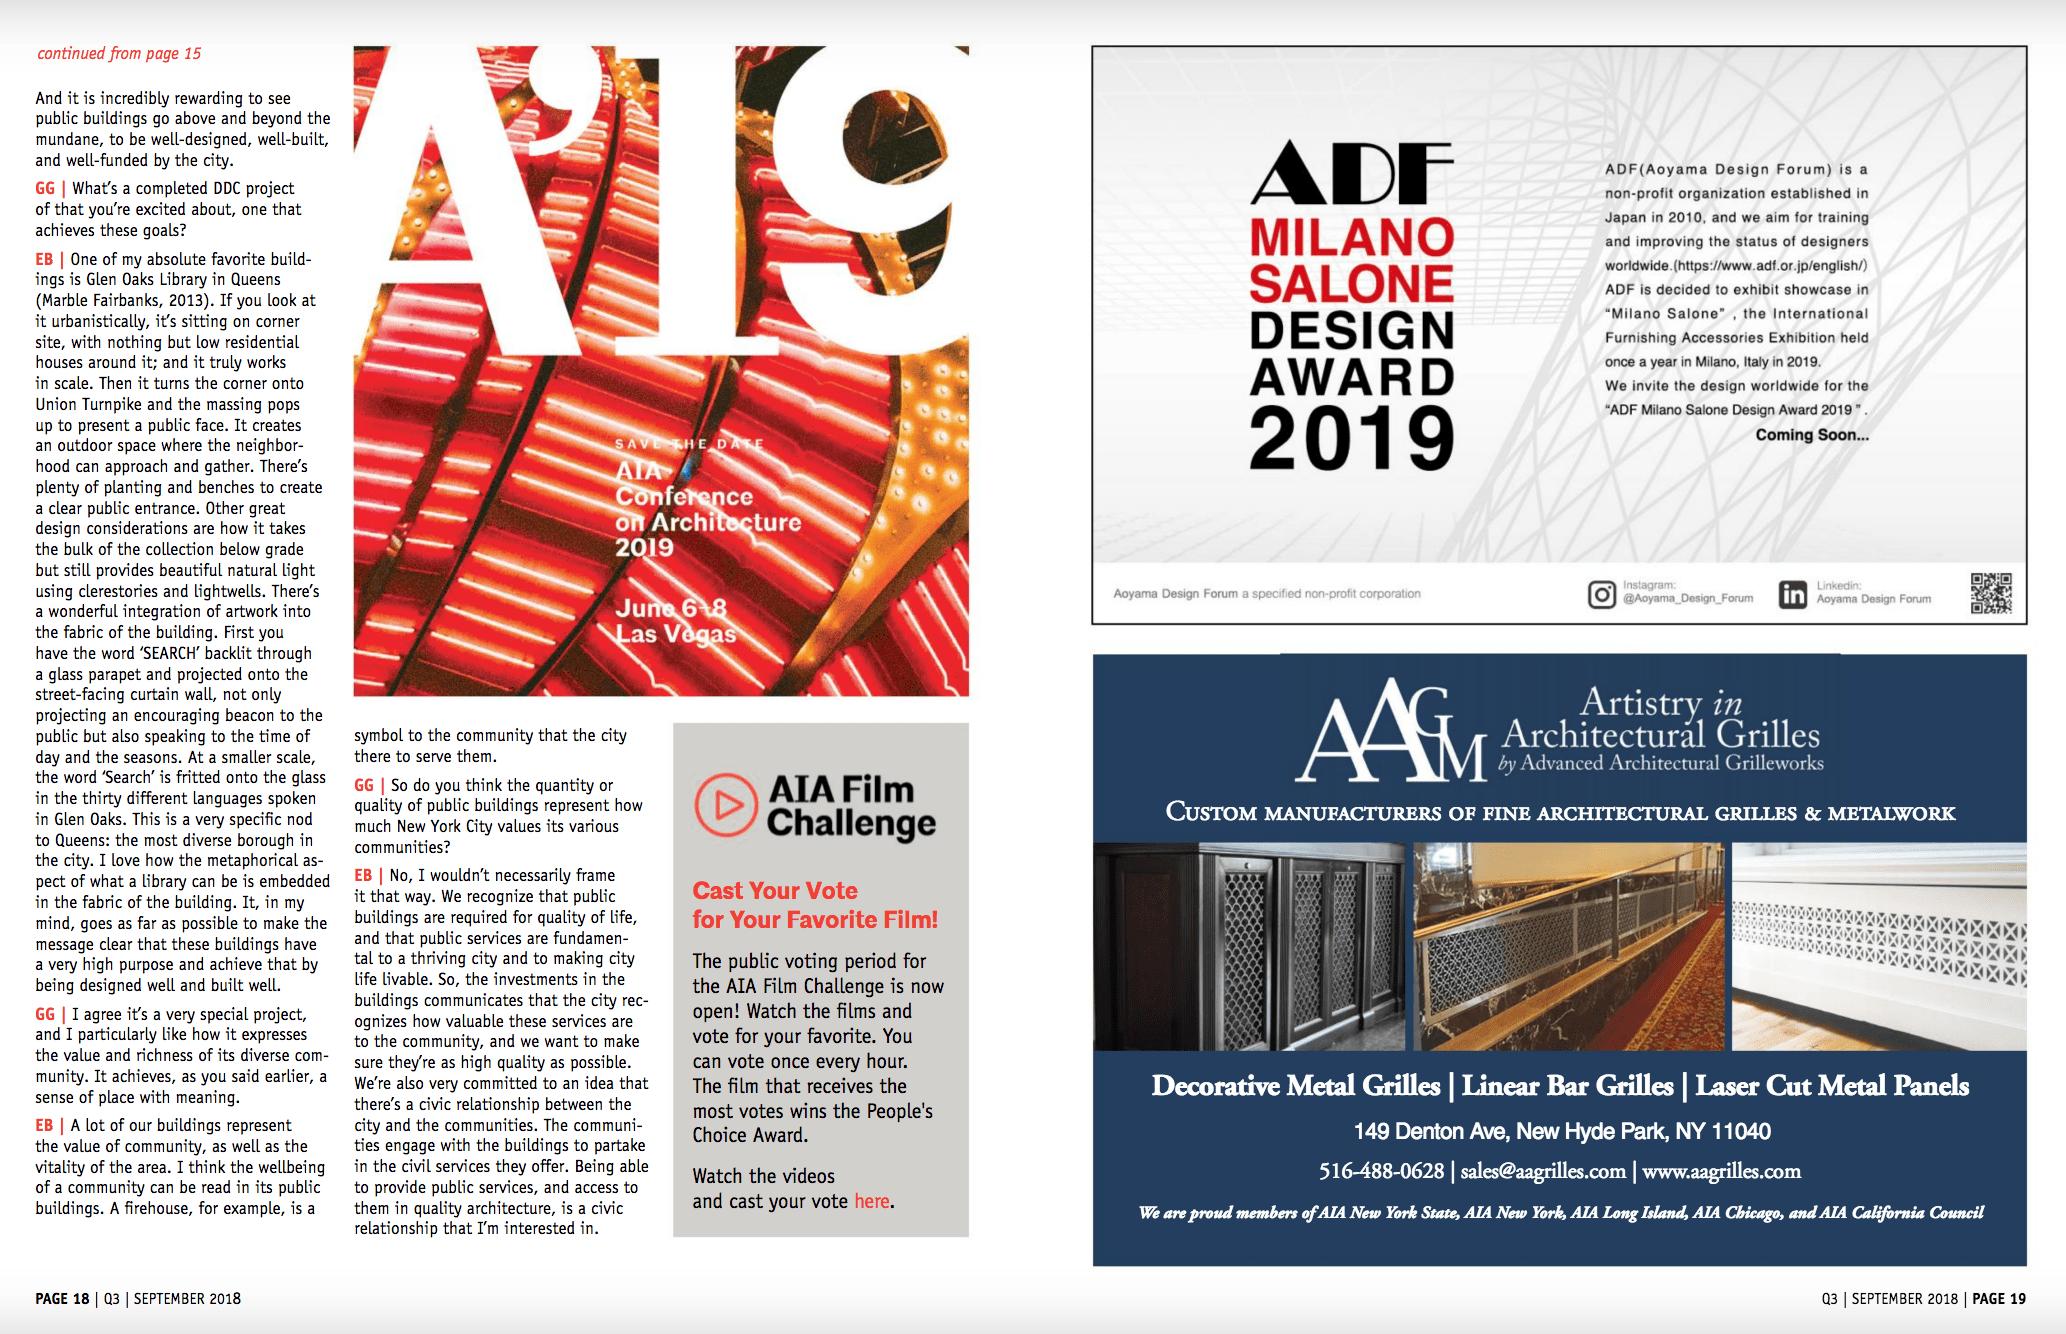 AIA NYS DigitalWebMagazineQ3ADF-Milano-Salone